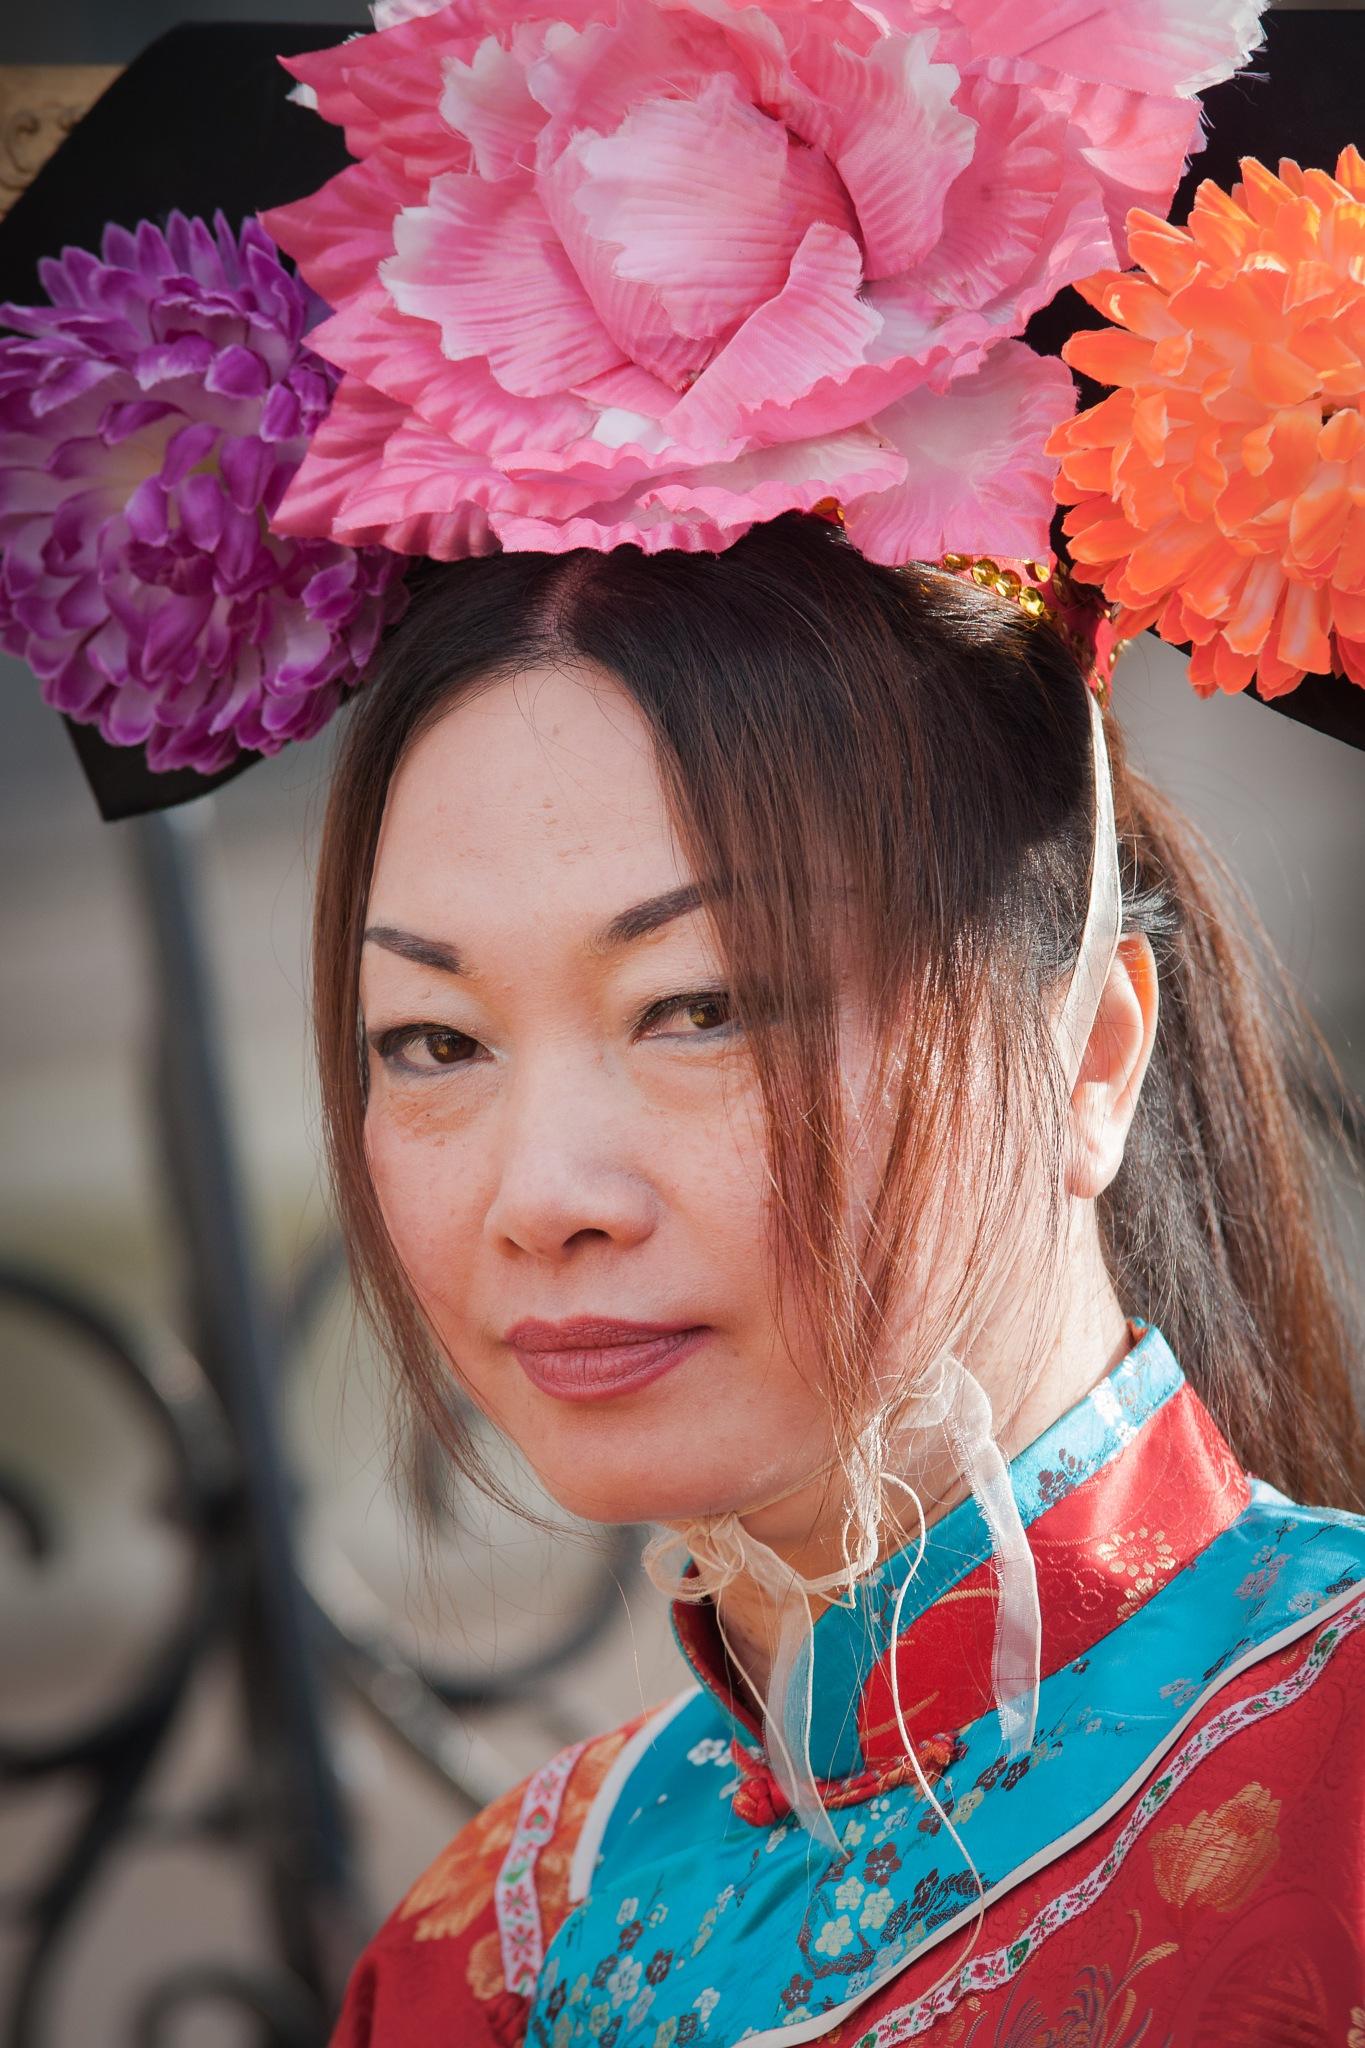 The flower lady by Hervé Samson